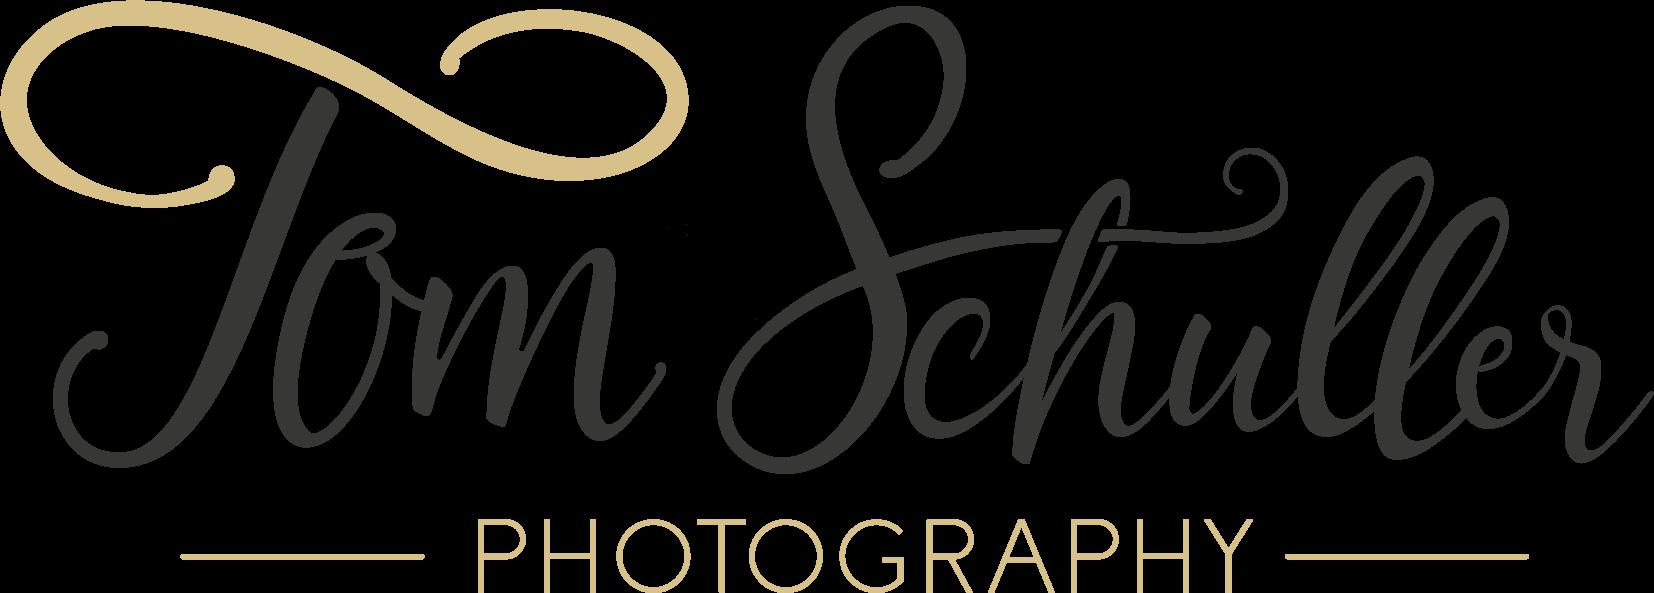 Hochzeitsfotograf Graz Tom Schuller Photography Logo White Retina